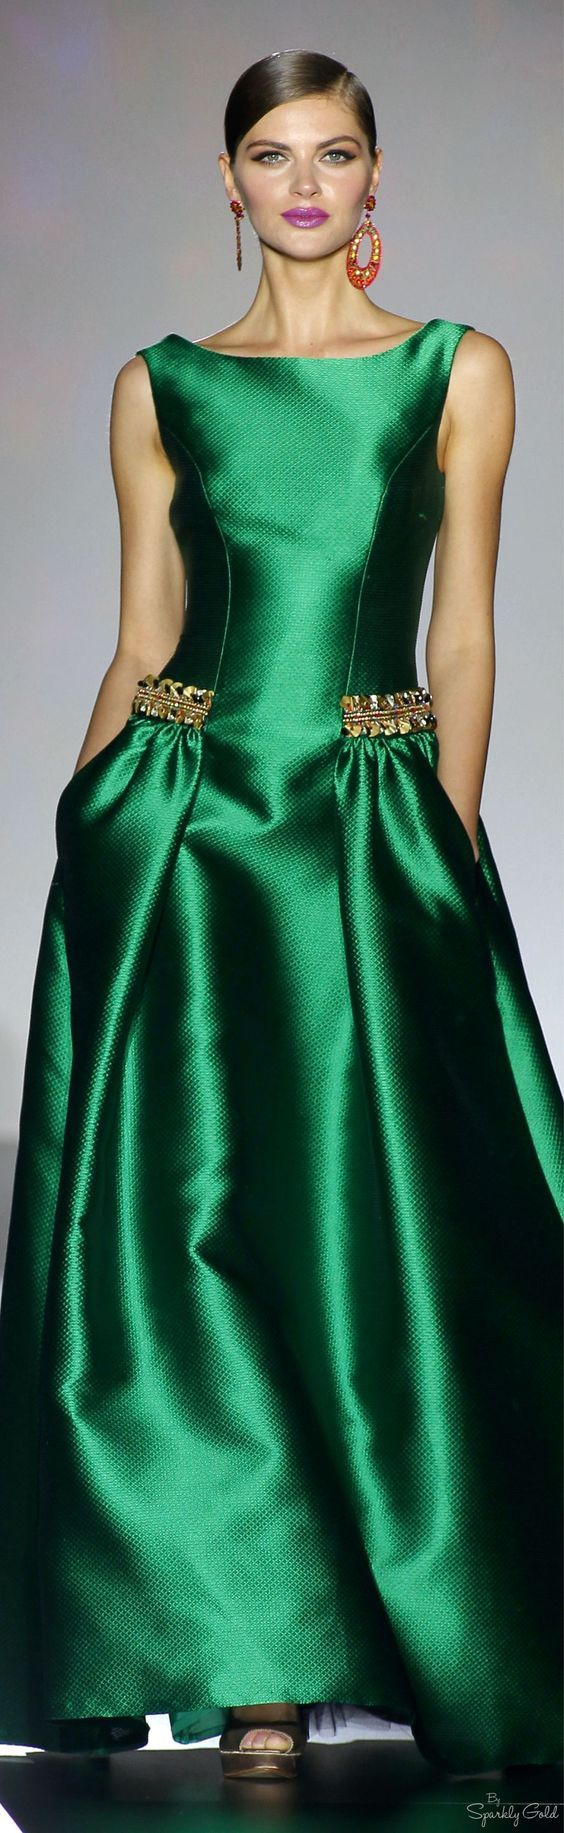 patricia avendaño 2016 | beautiful dresses, green dress, dresses